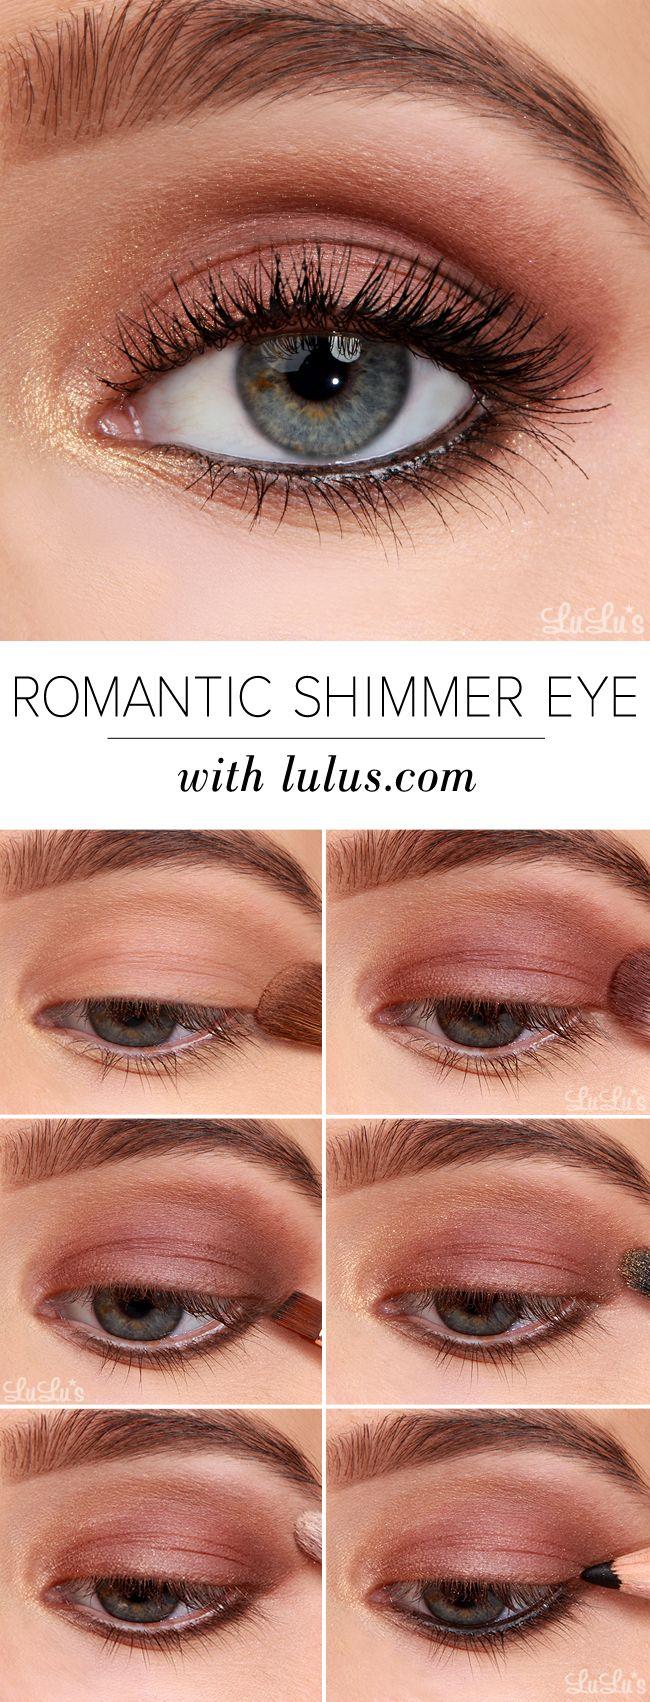 How-To: Romantic Shimmer Eyeshadow Tutorial   Blog LuLu*s